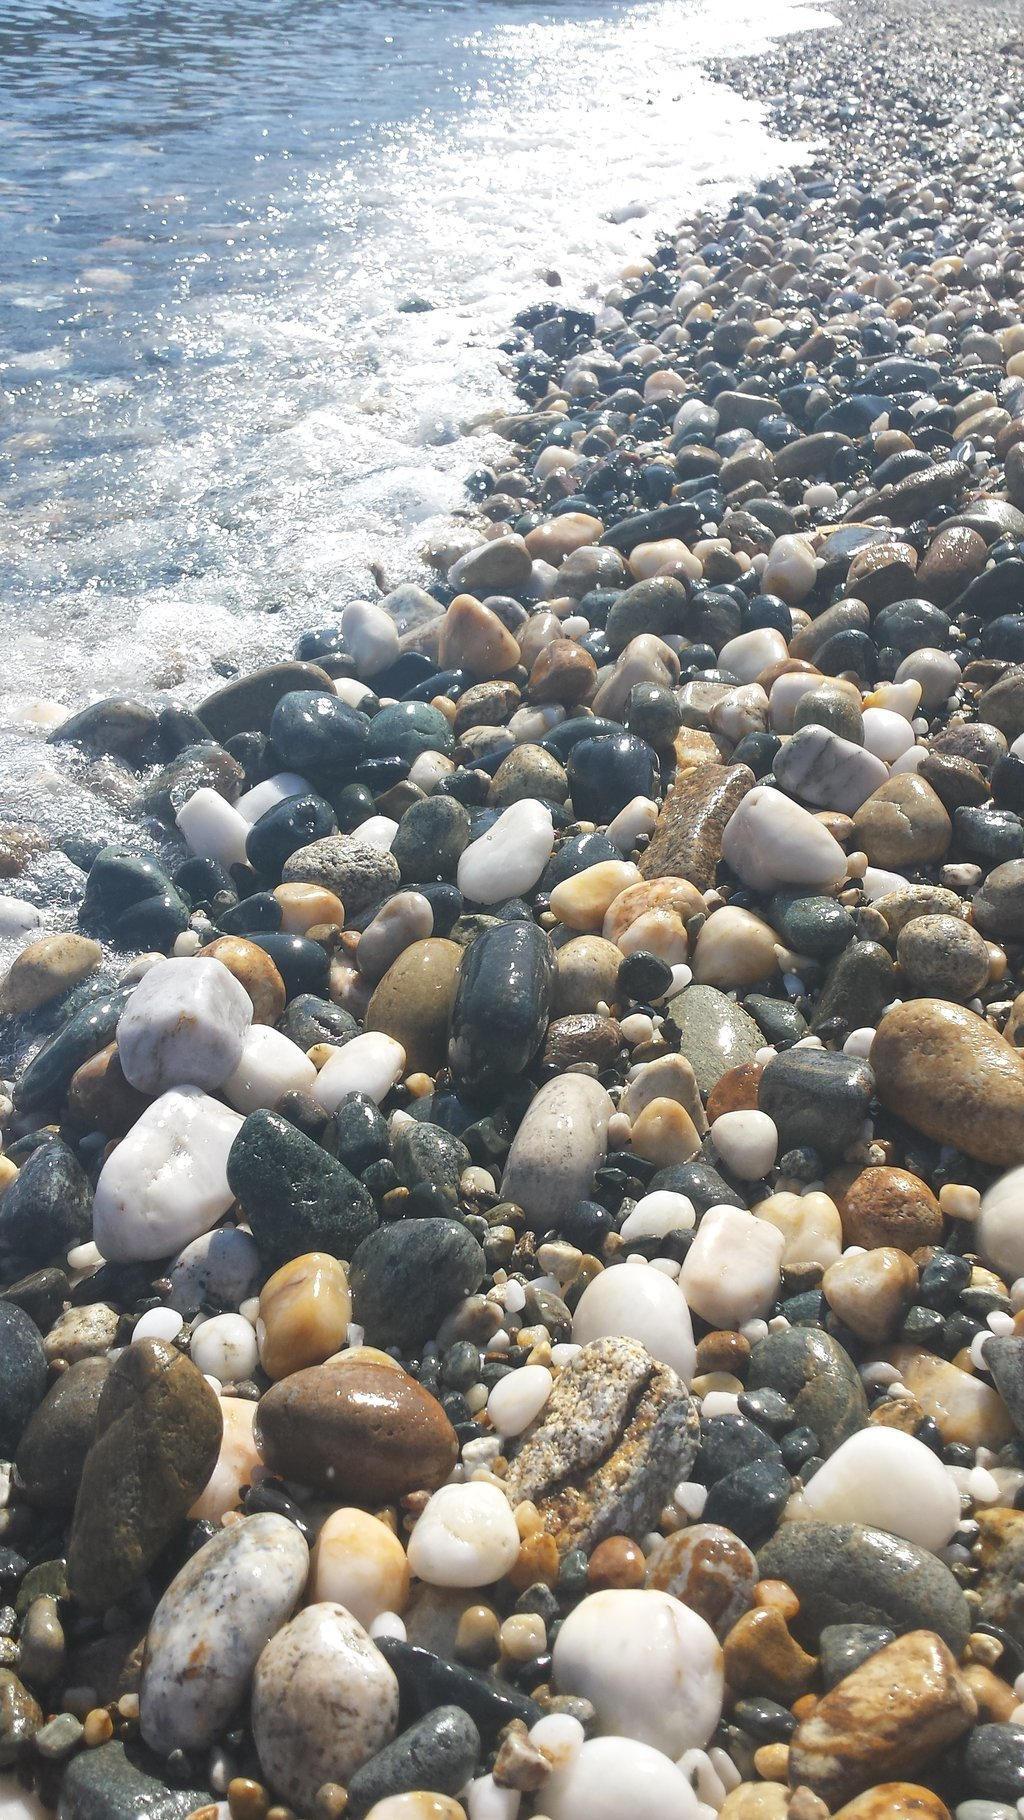 livada beach2 by solstiziodinverno